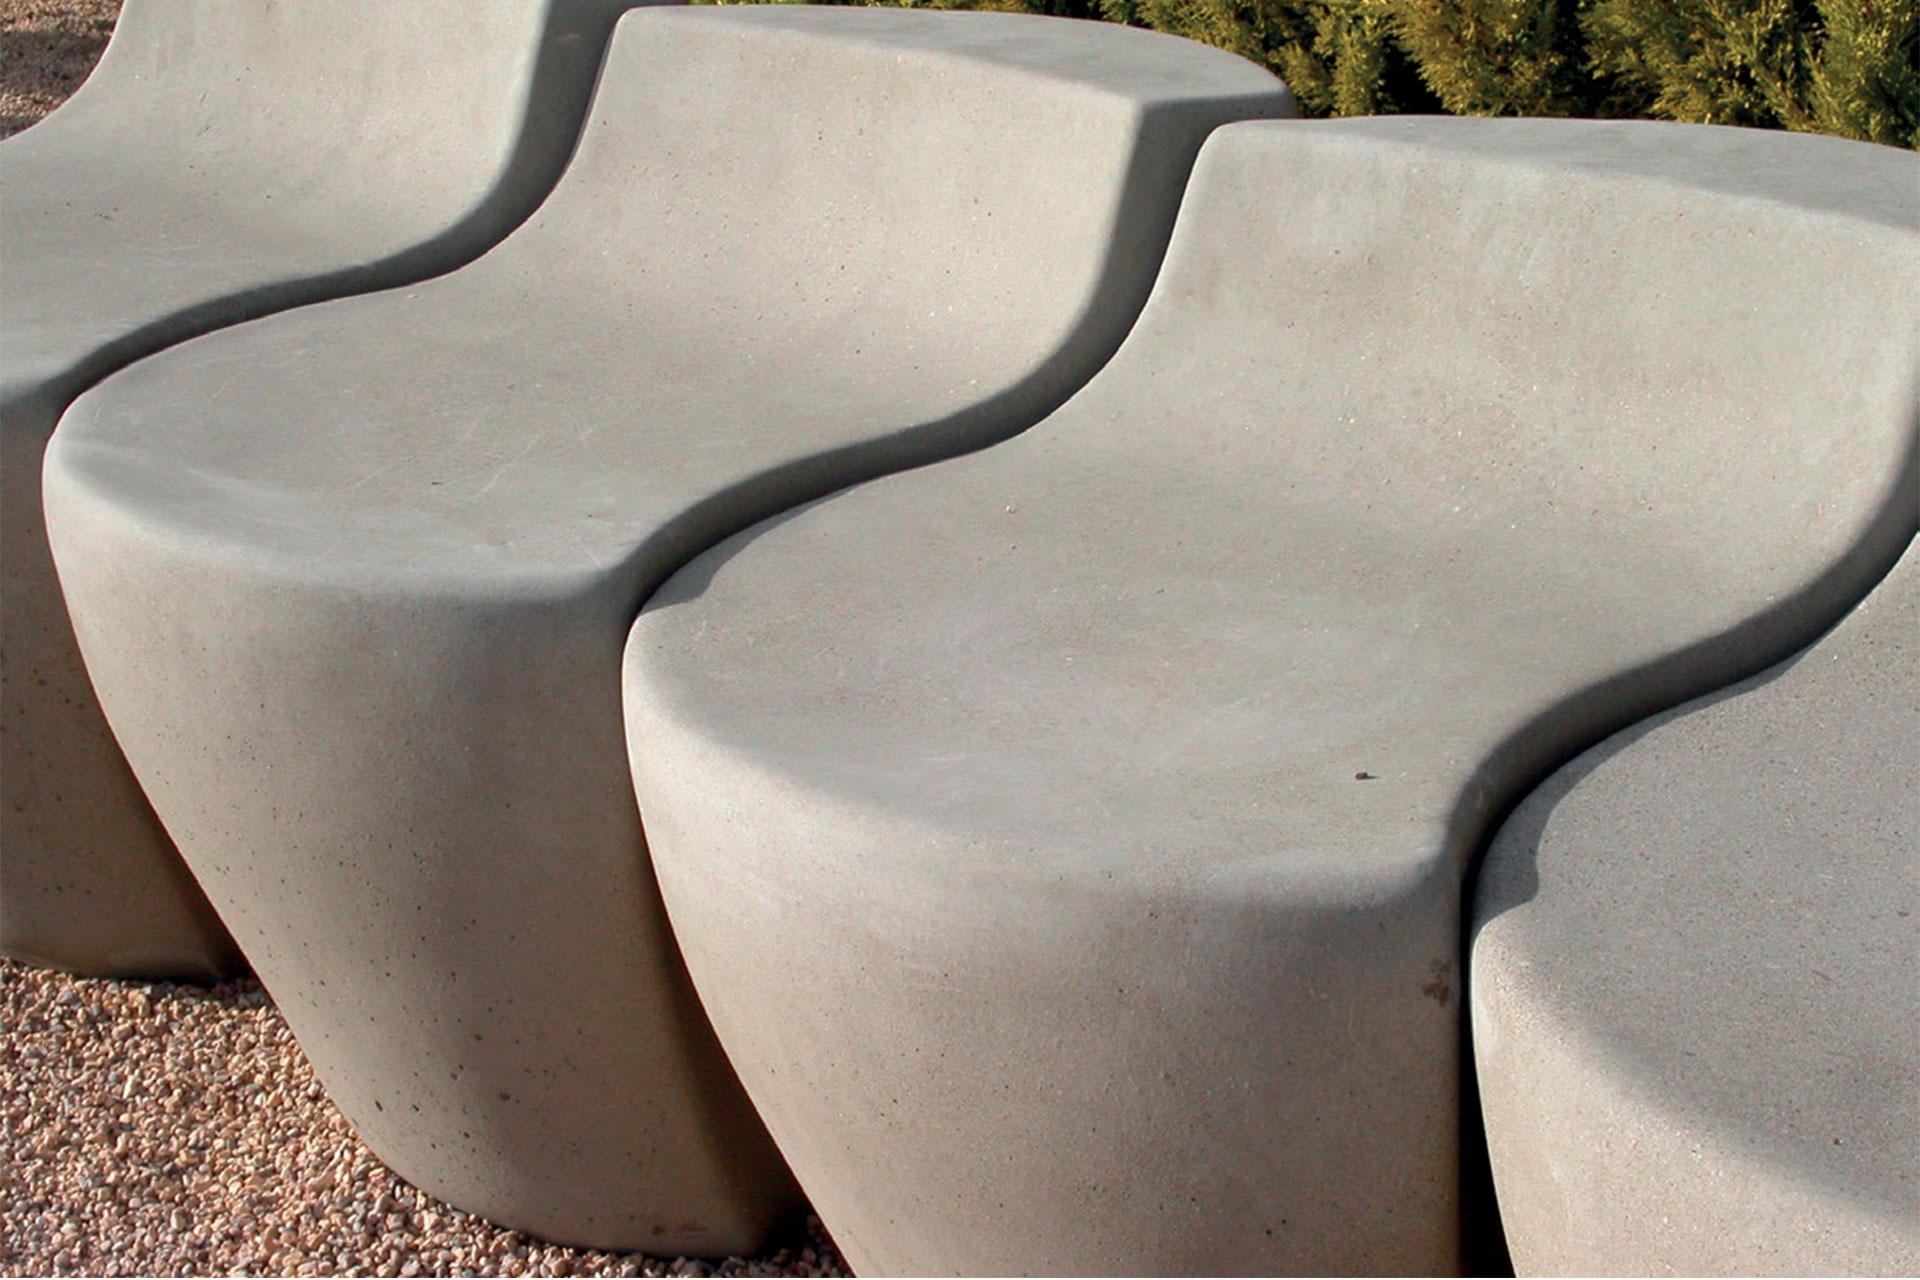 UrbanObjekts Cuc Sitzgelegenheit